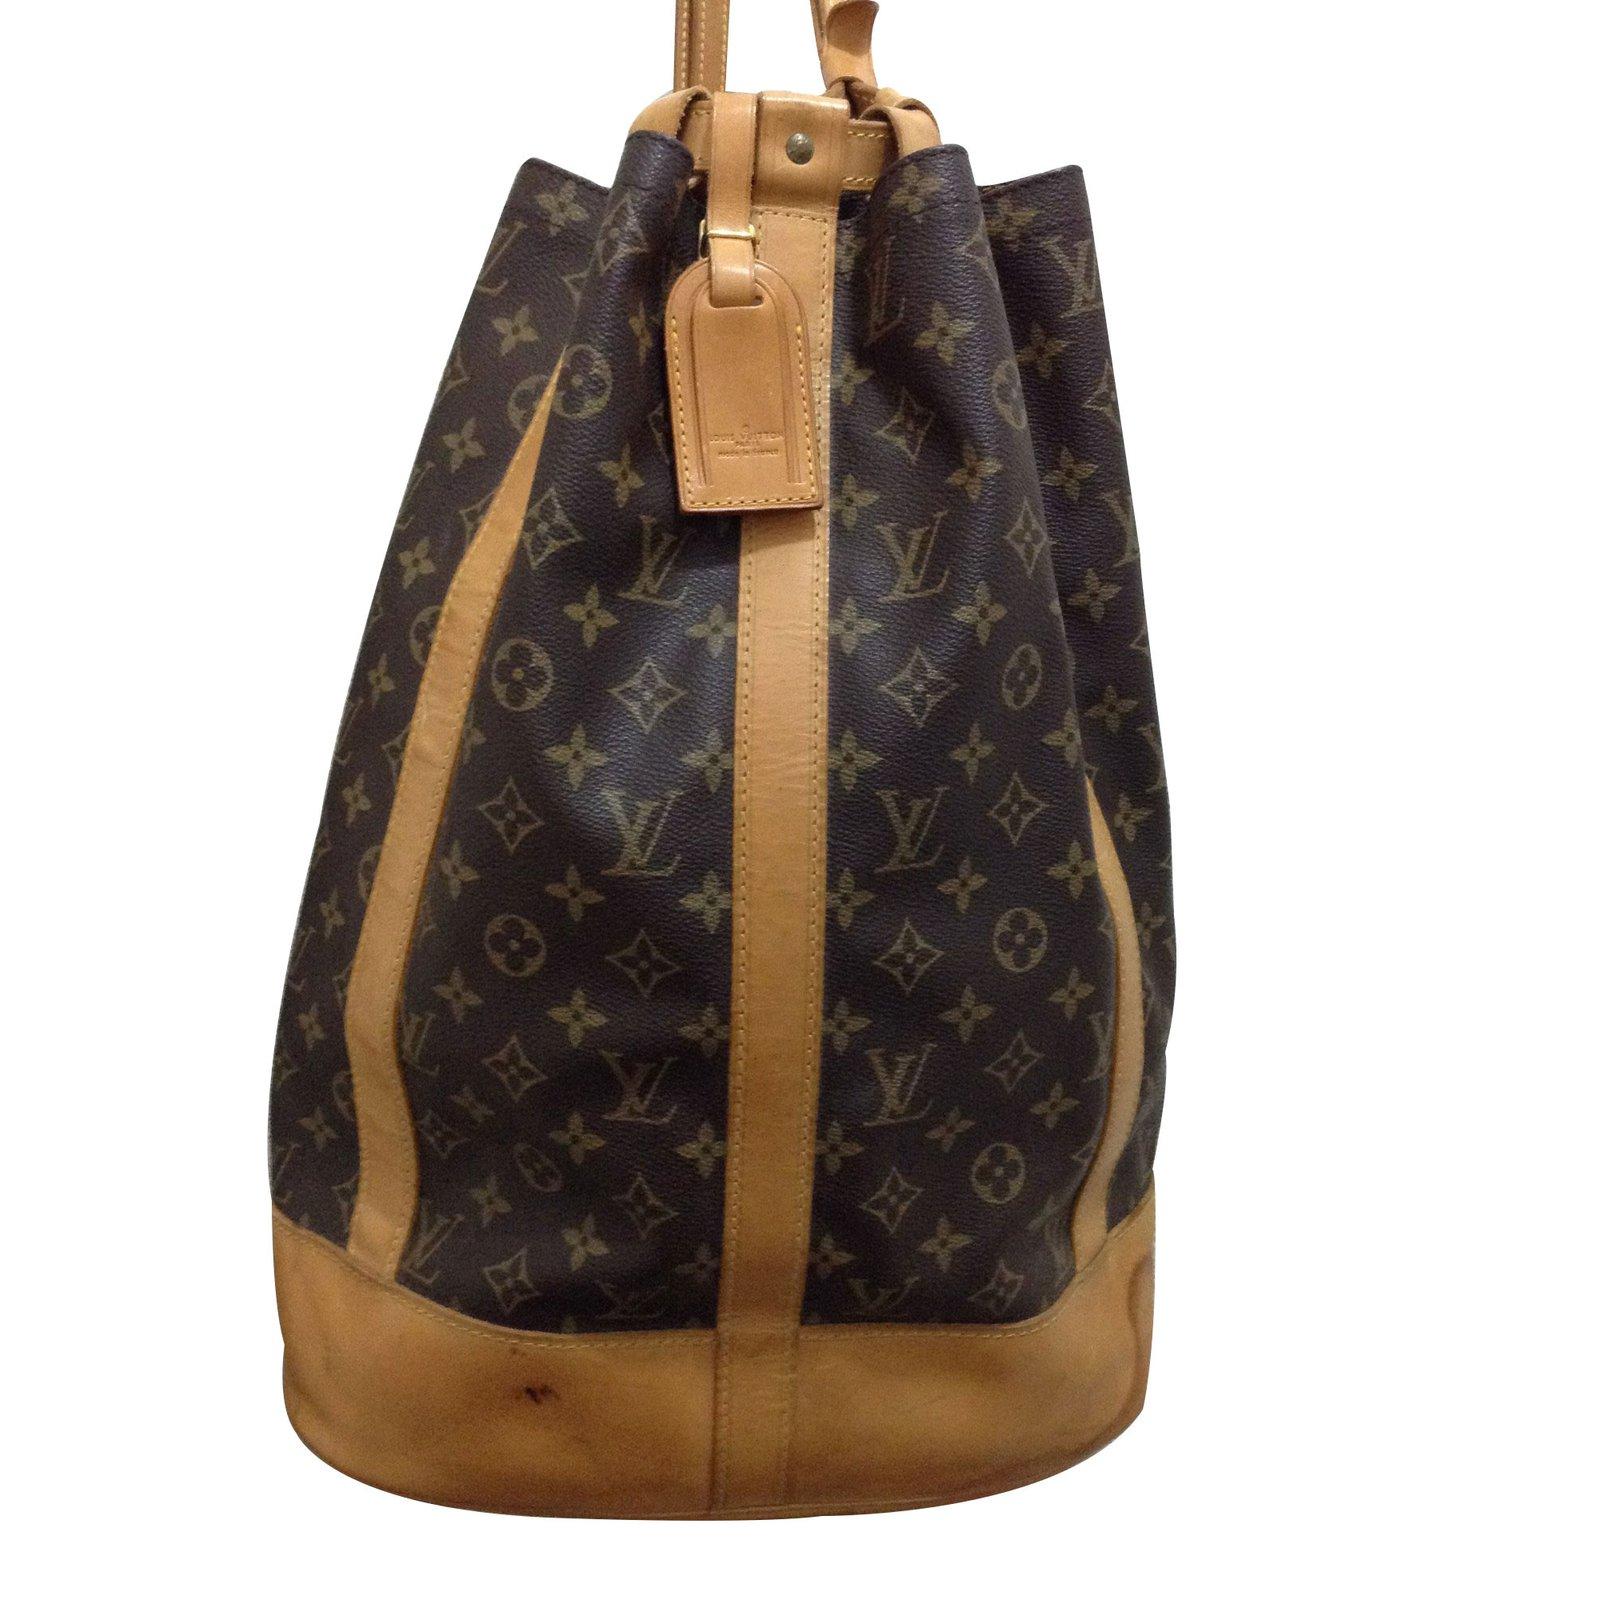 Sacs à dos Louis Vuitton sac randonnée ou marin Toile marron clair ref.9548